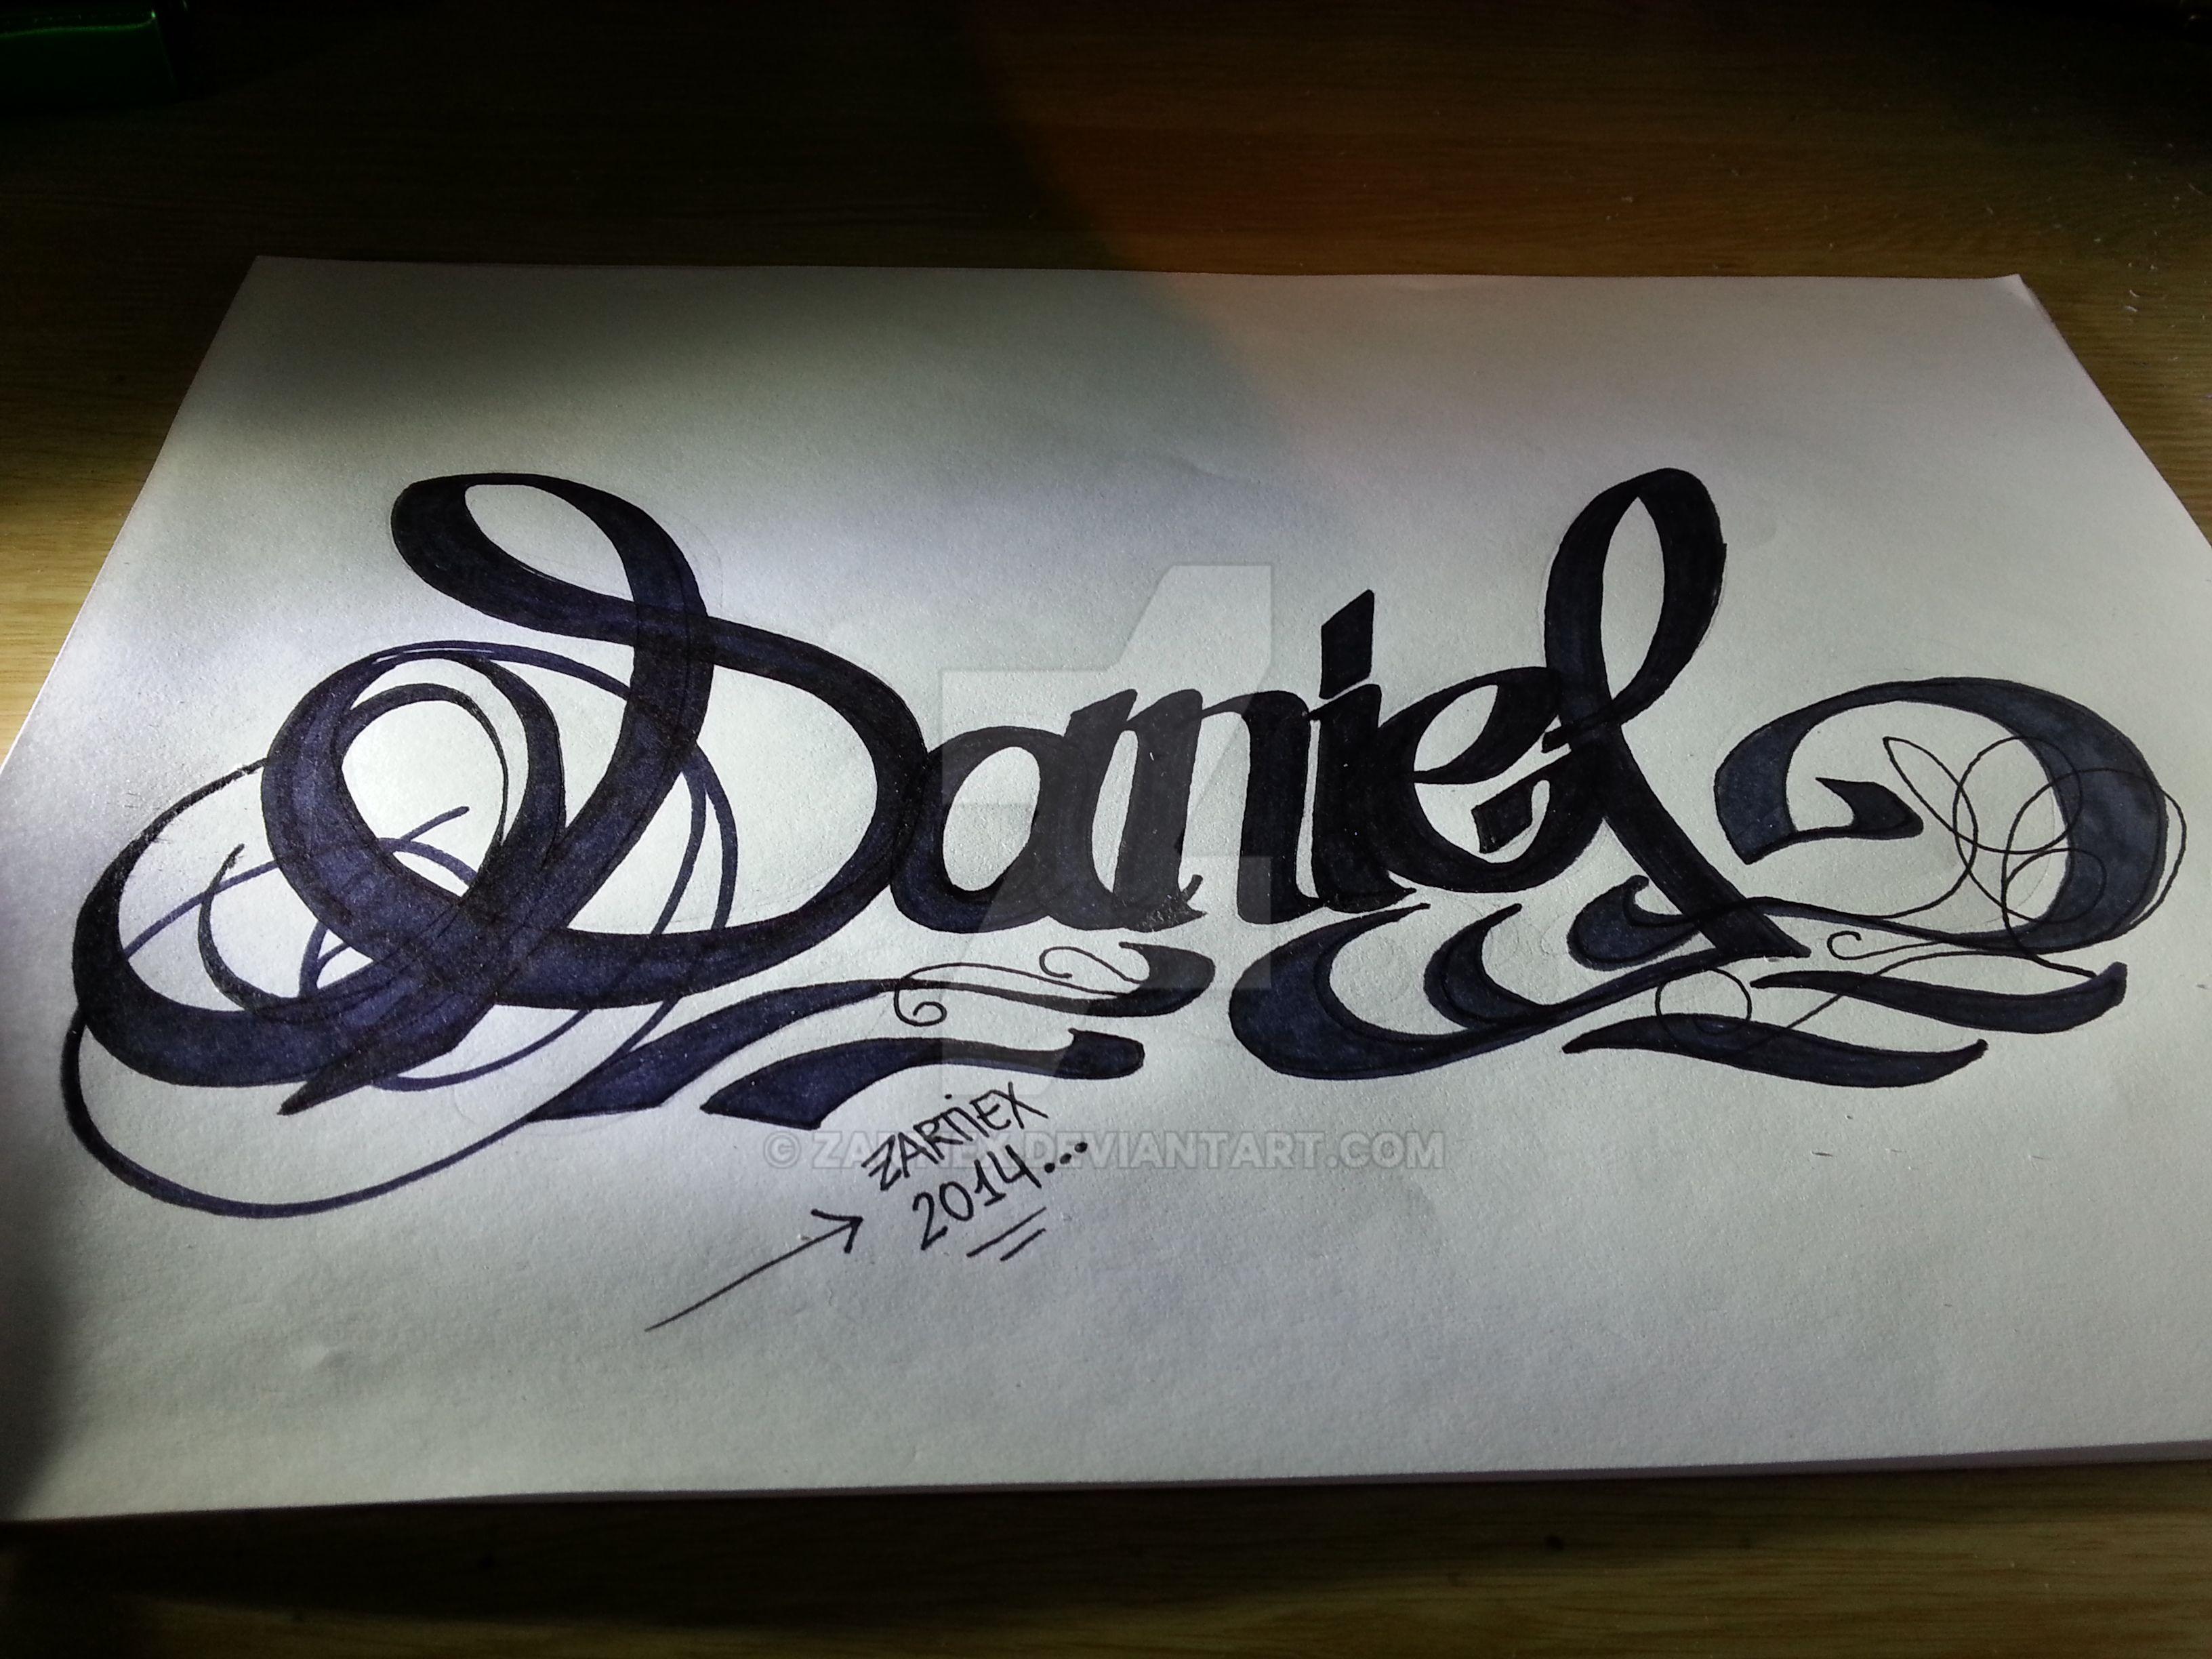 imagenes de graffitis para dibujar a lapiz de nombres